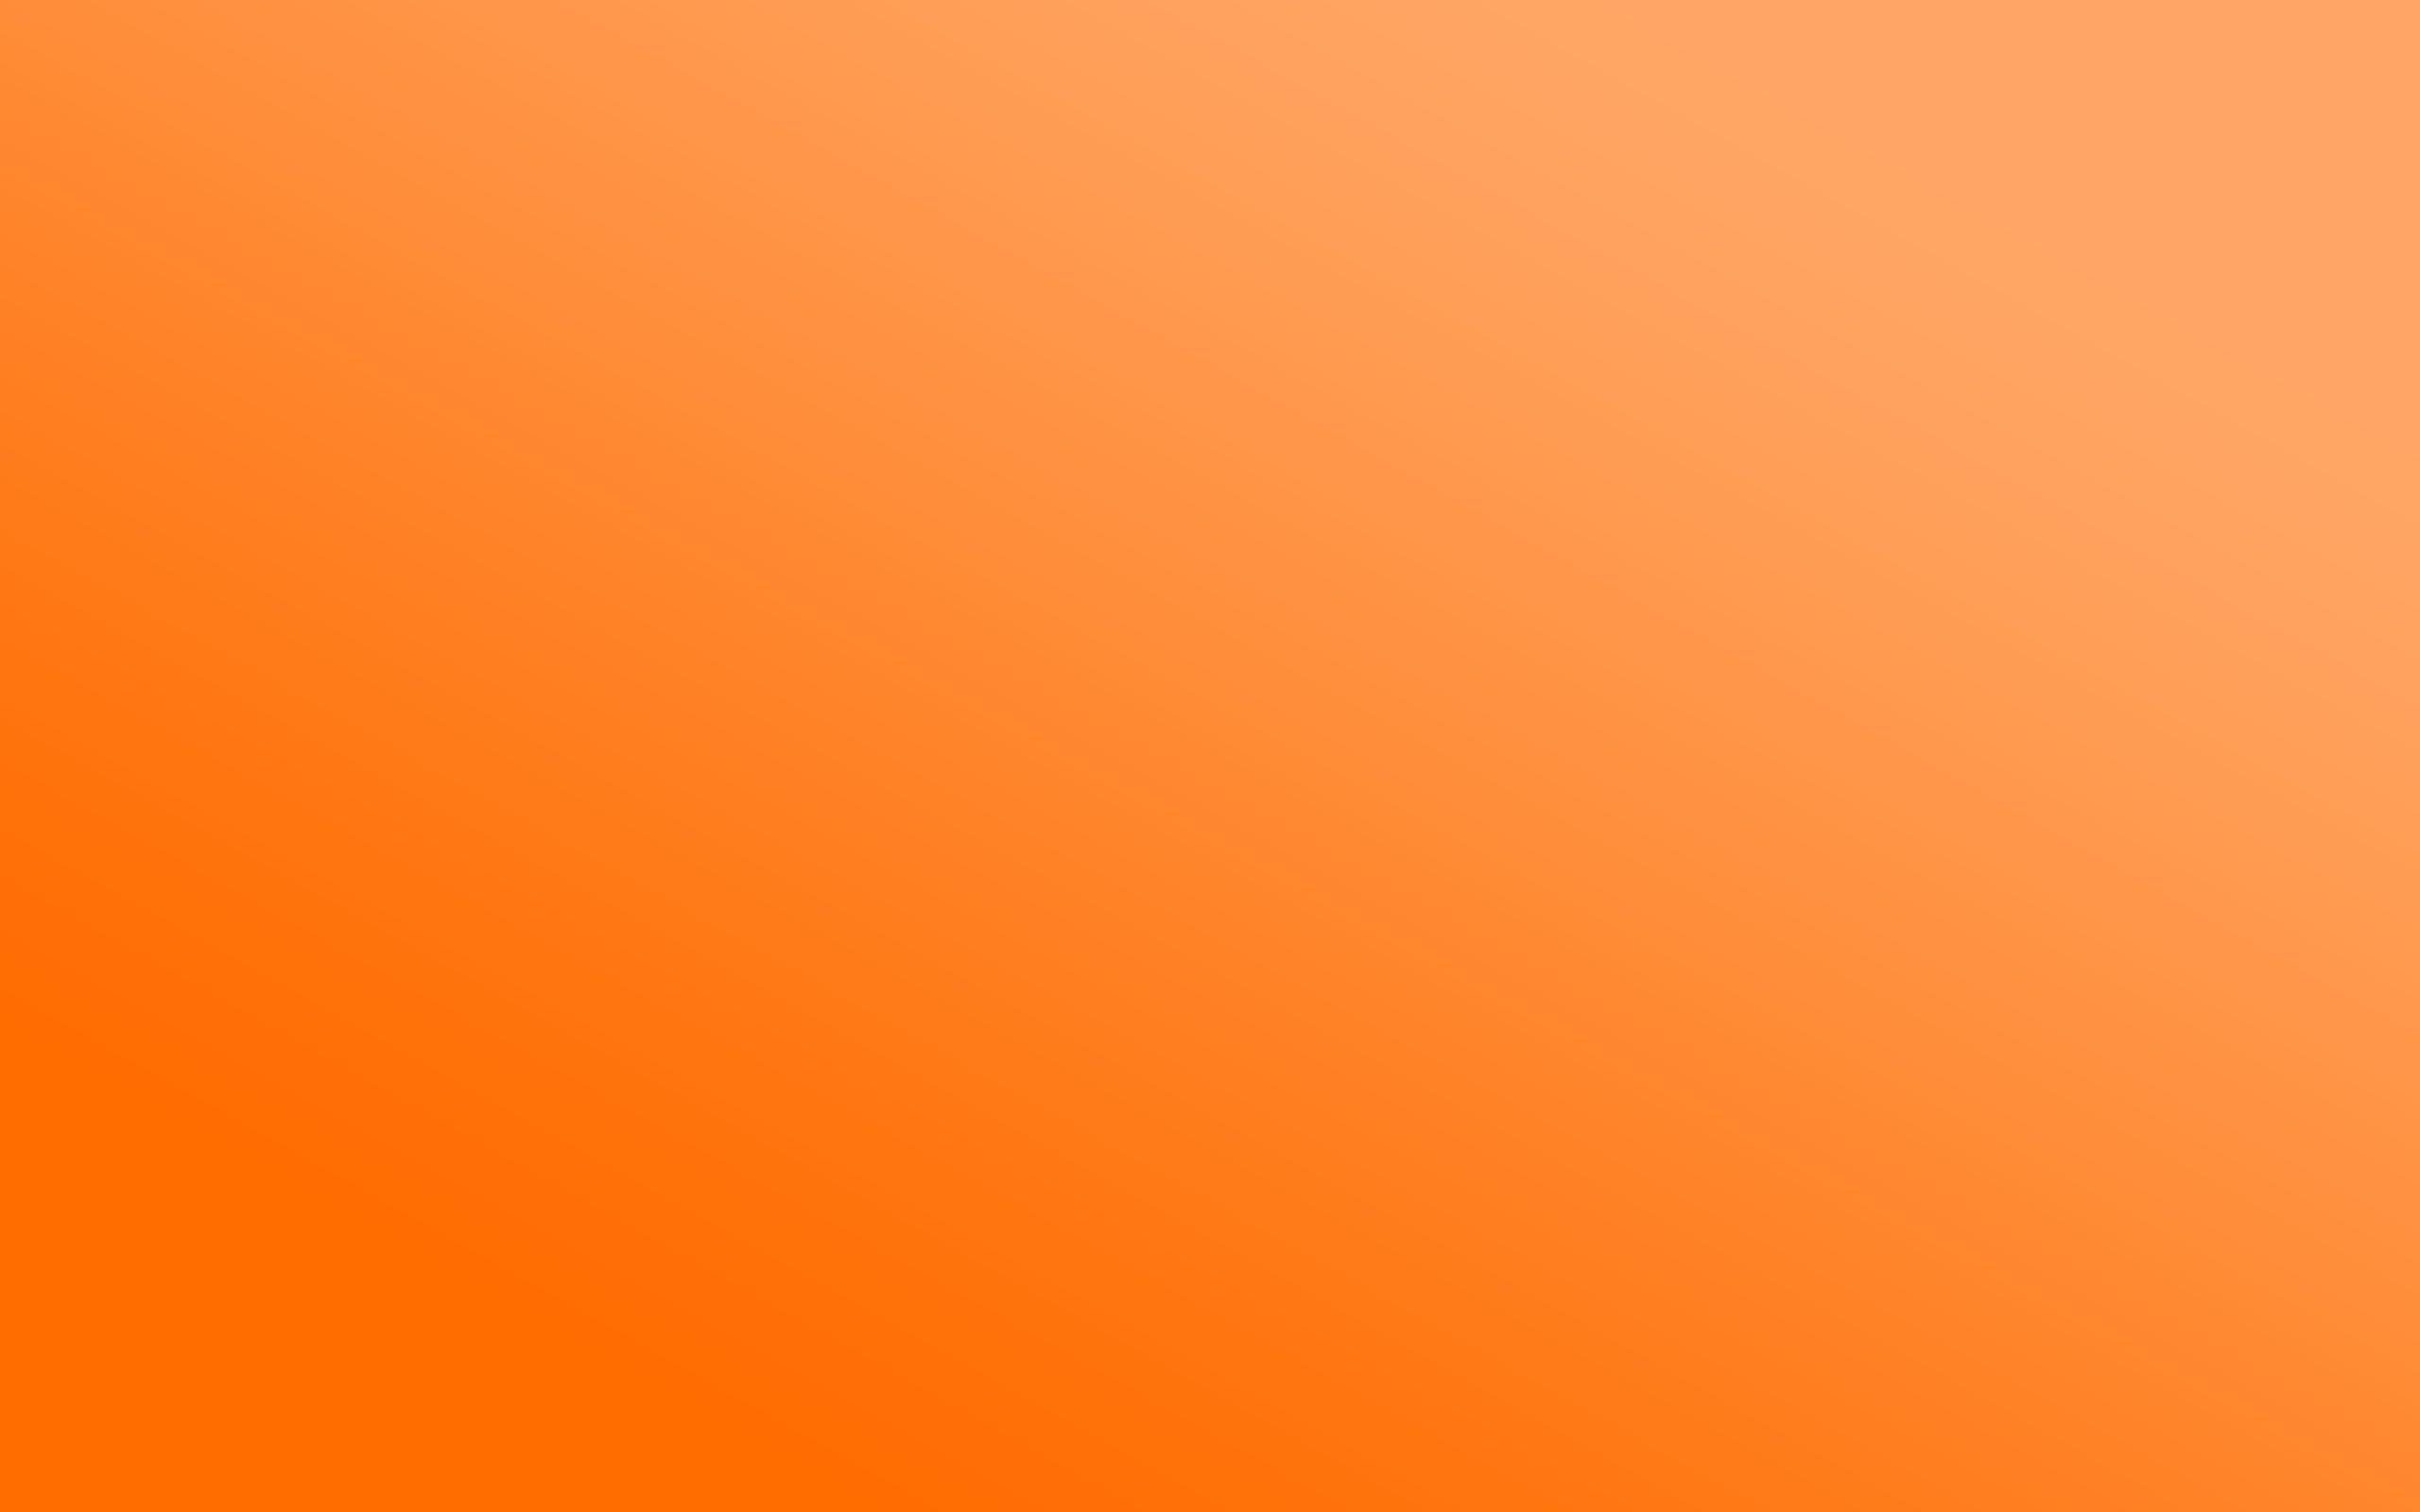 Sfondi Arancioni 75 Immagini